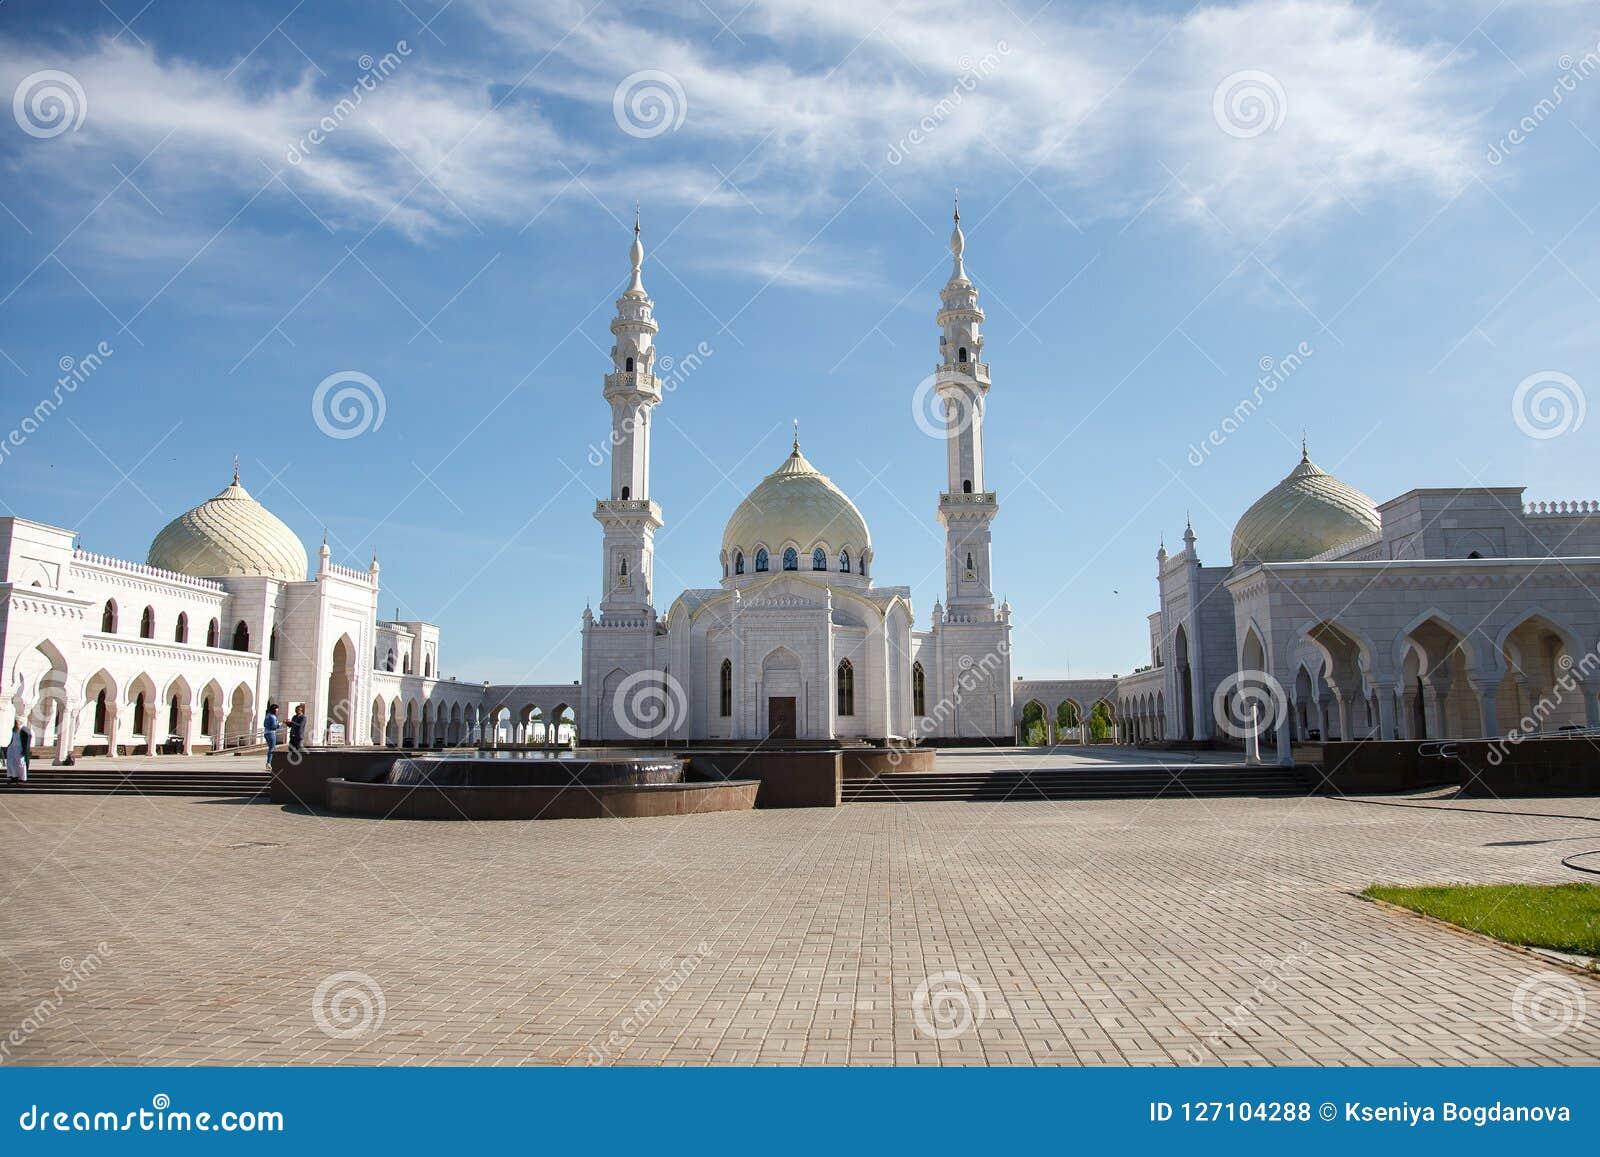 Witte moskee in aanbouw in Bolgar, Tatarstan, Rusland